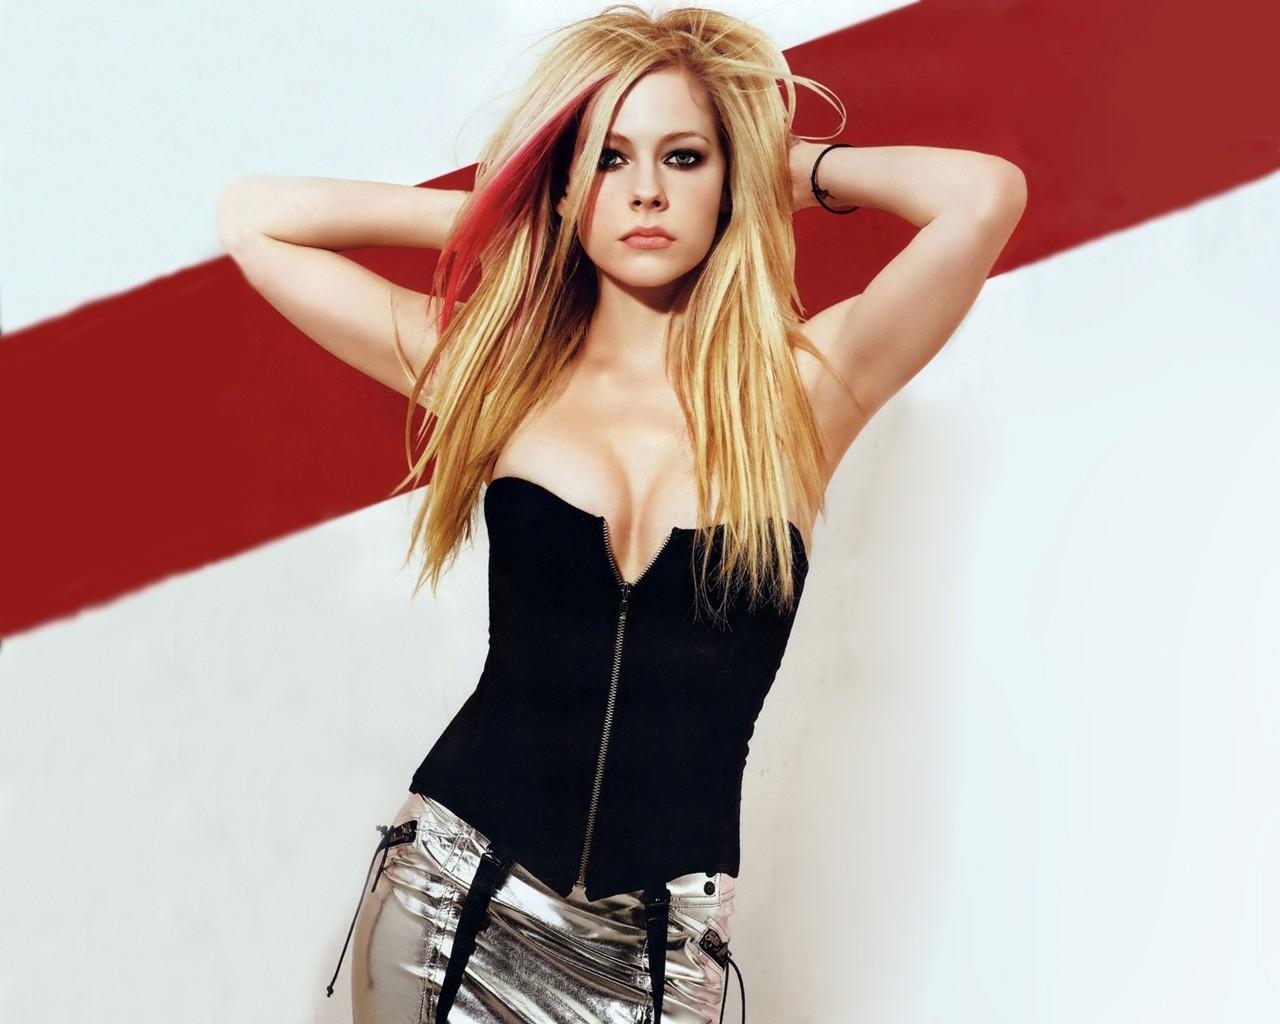 http://4.bp.blogspot.com/-imsIF3jQHCY/TWCRFdxuEeI/AAAAAAAAA1A/RDl8Zc5_sTM/s1600/Avril_Lavigne_44.jpg